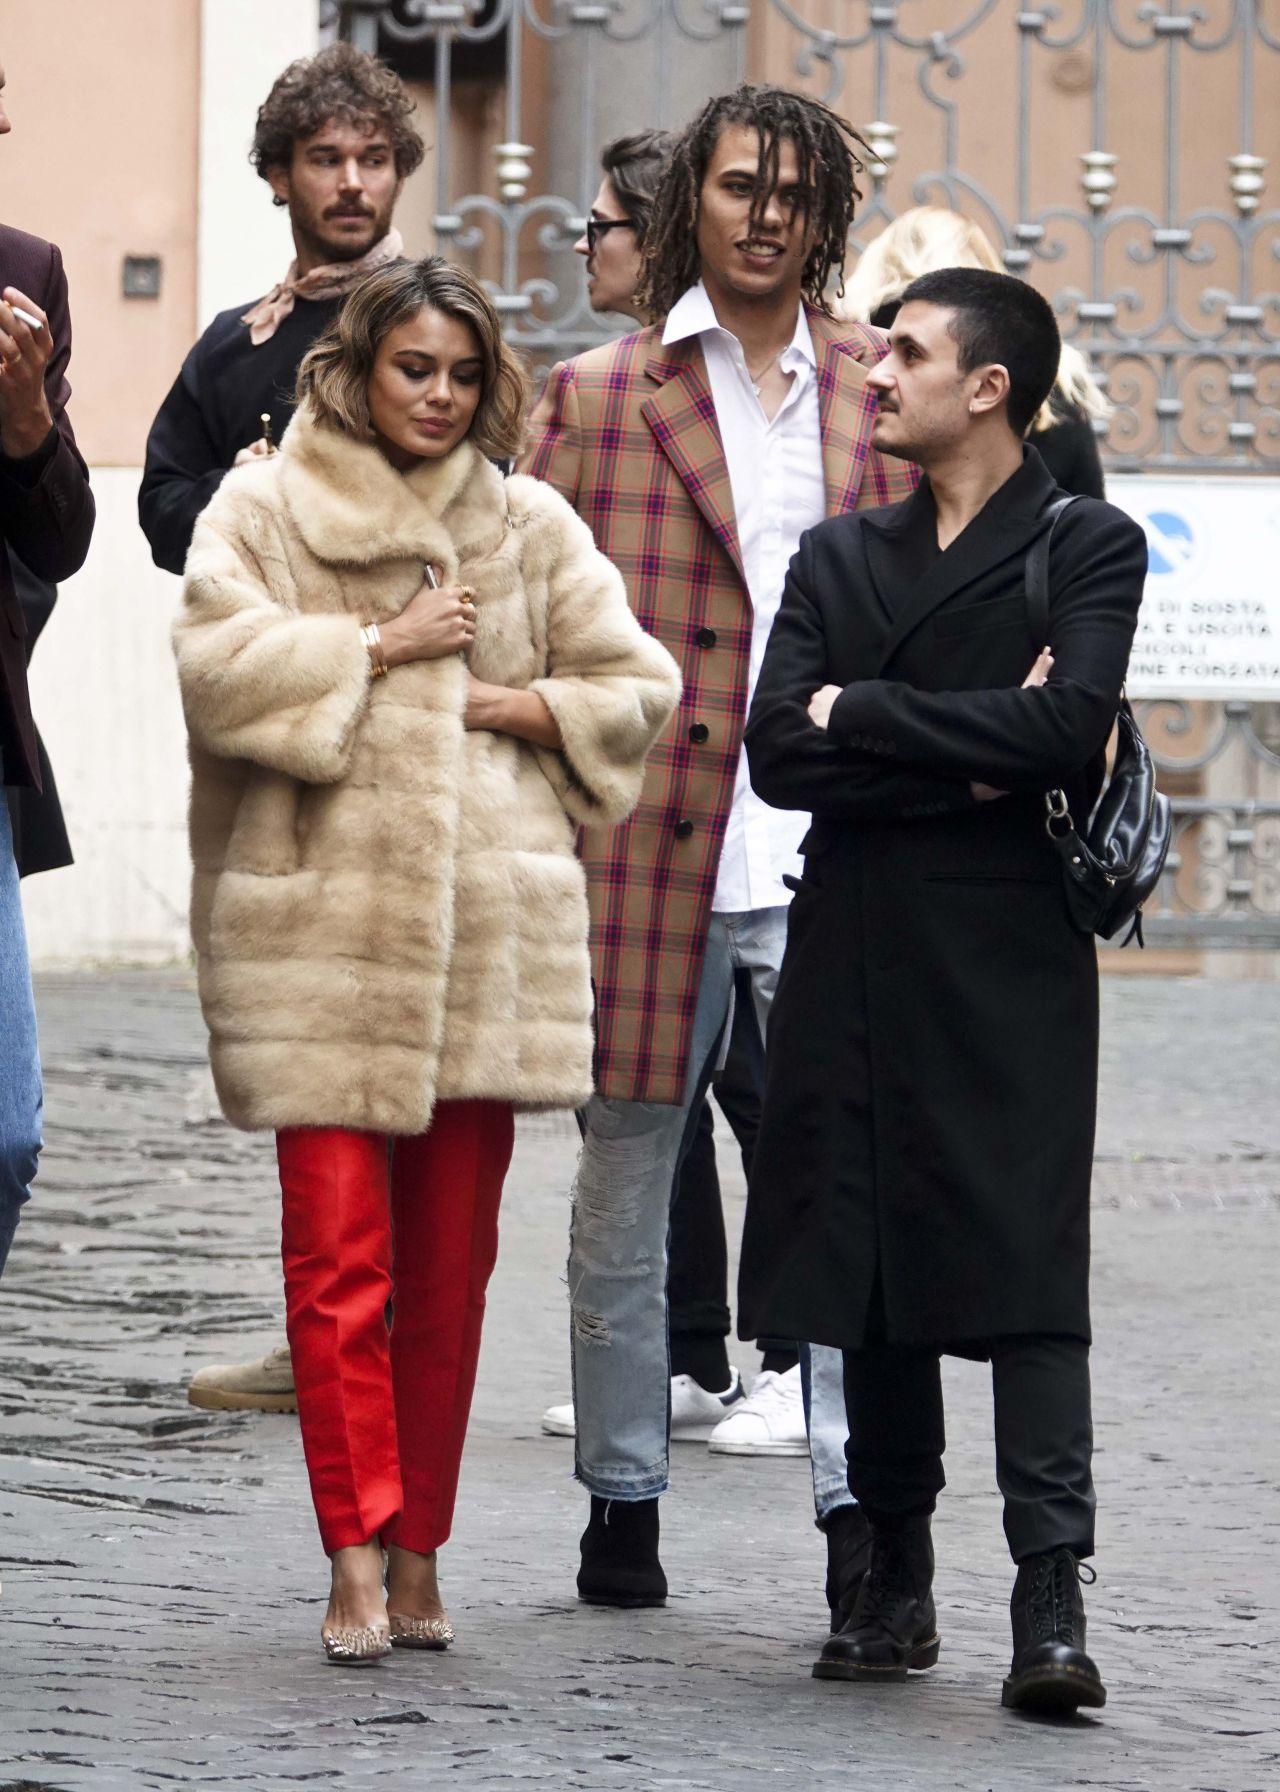 19 Stylish Fall Outfits Worth Copying: Nathalie Kelley Street Fashion